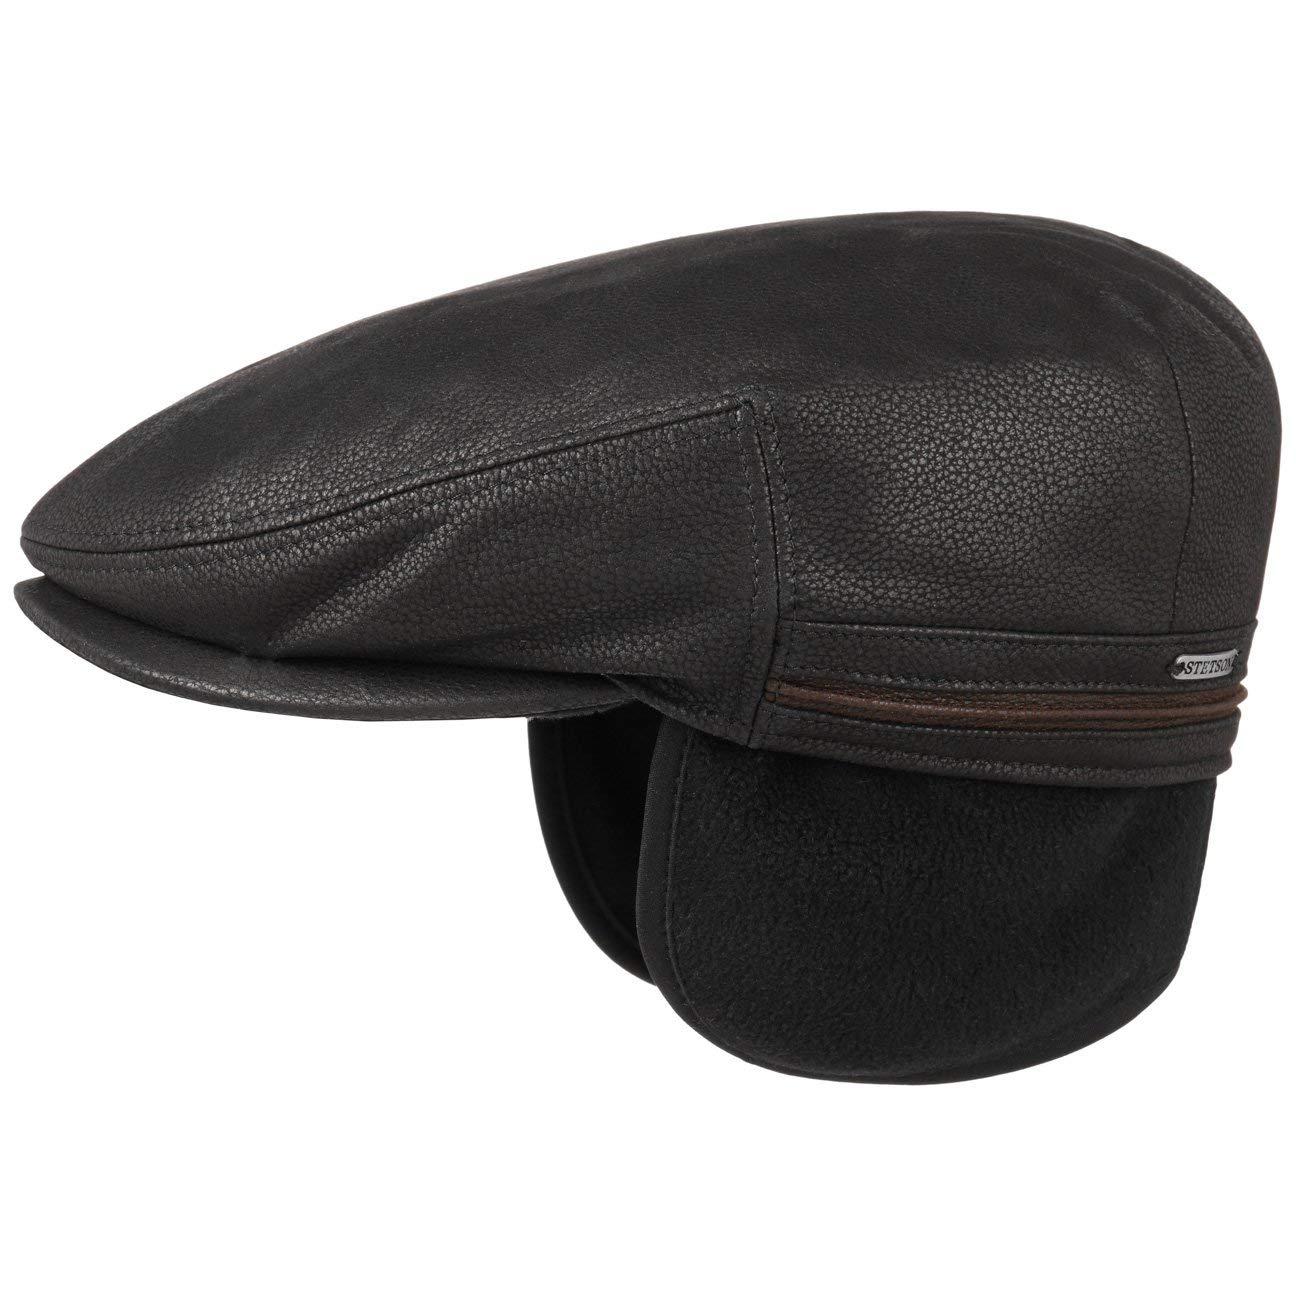 14c94e2e25a54 Stetson Kent Earflaps Leather Flat Cap Men